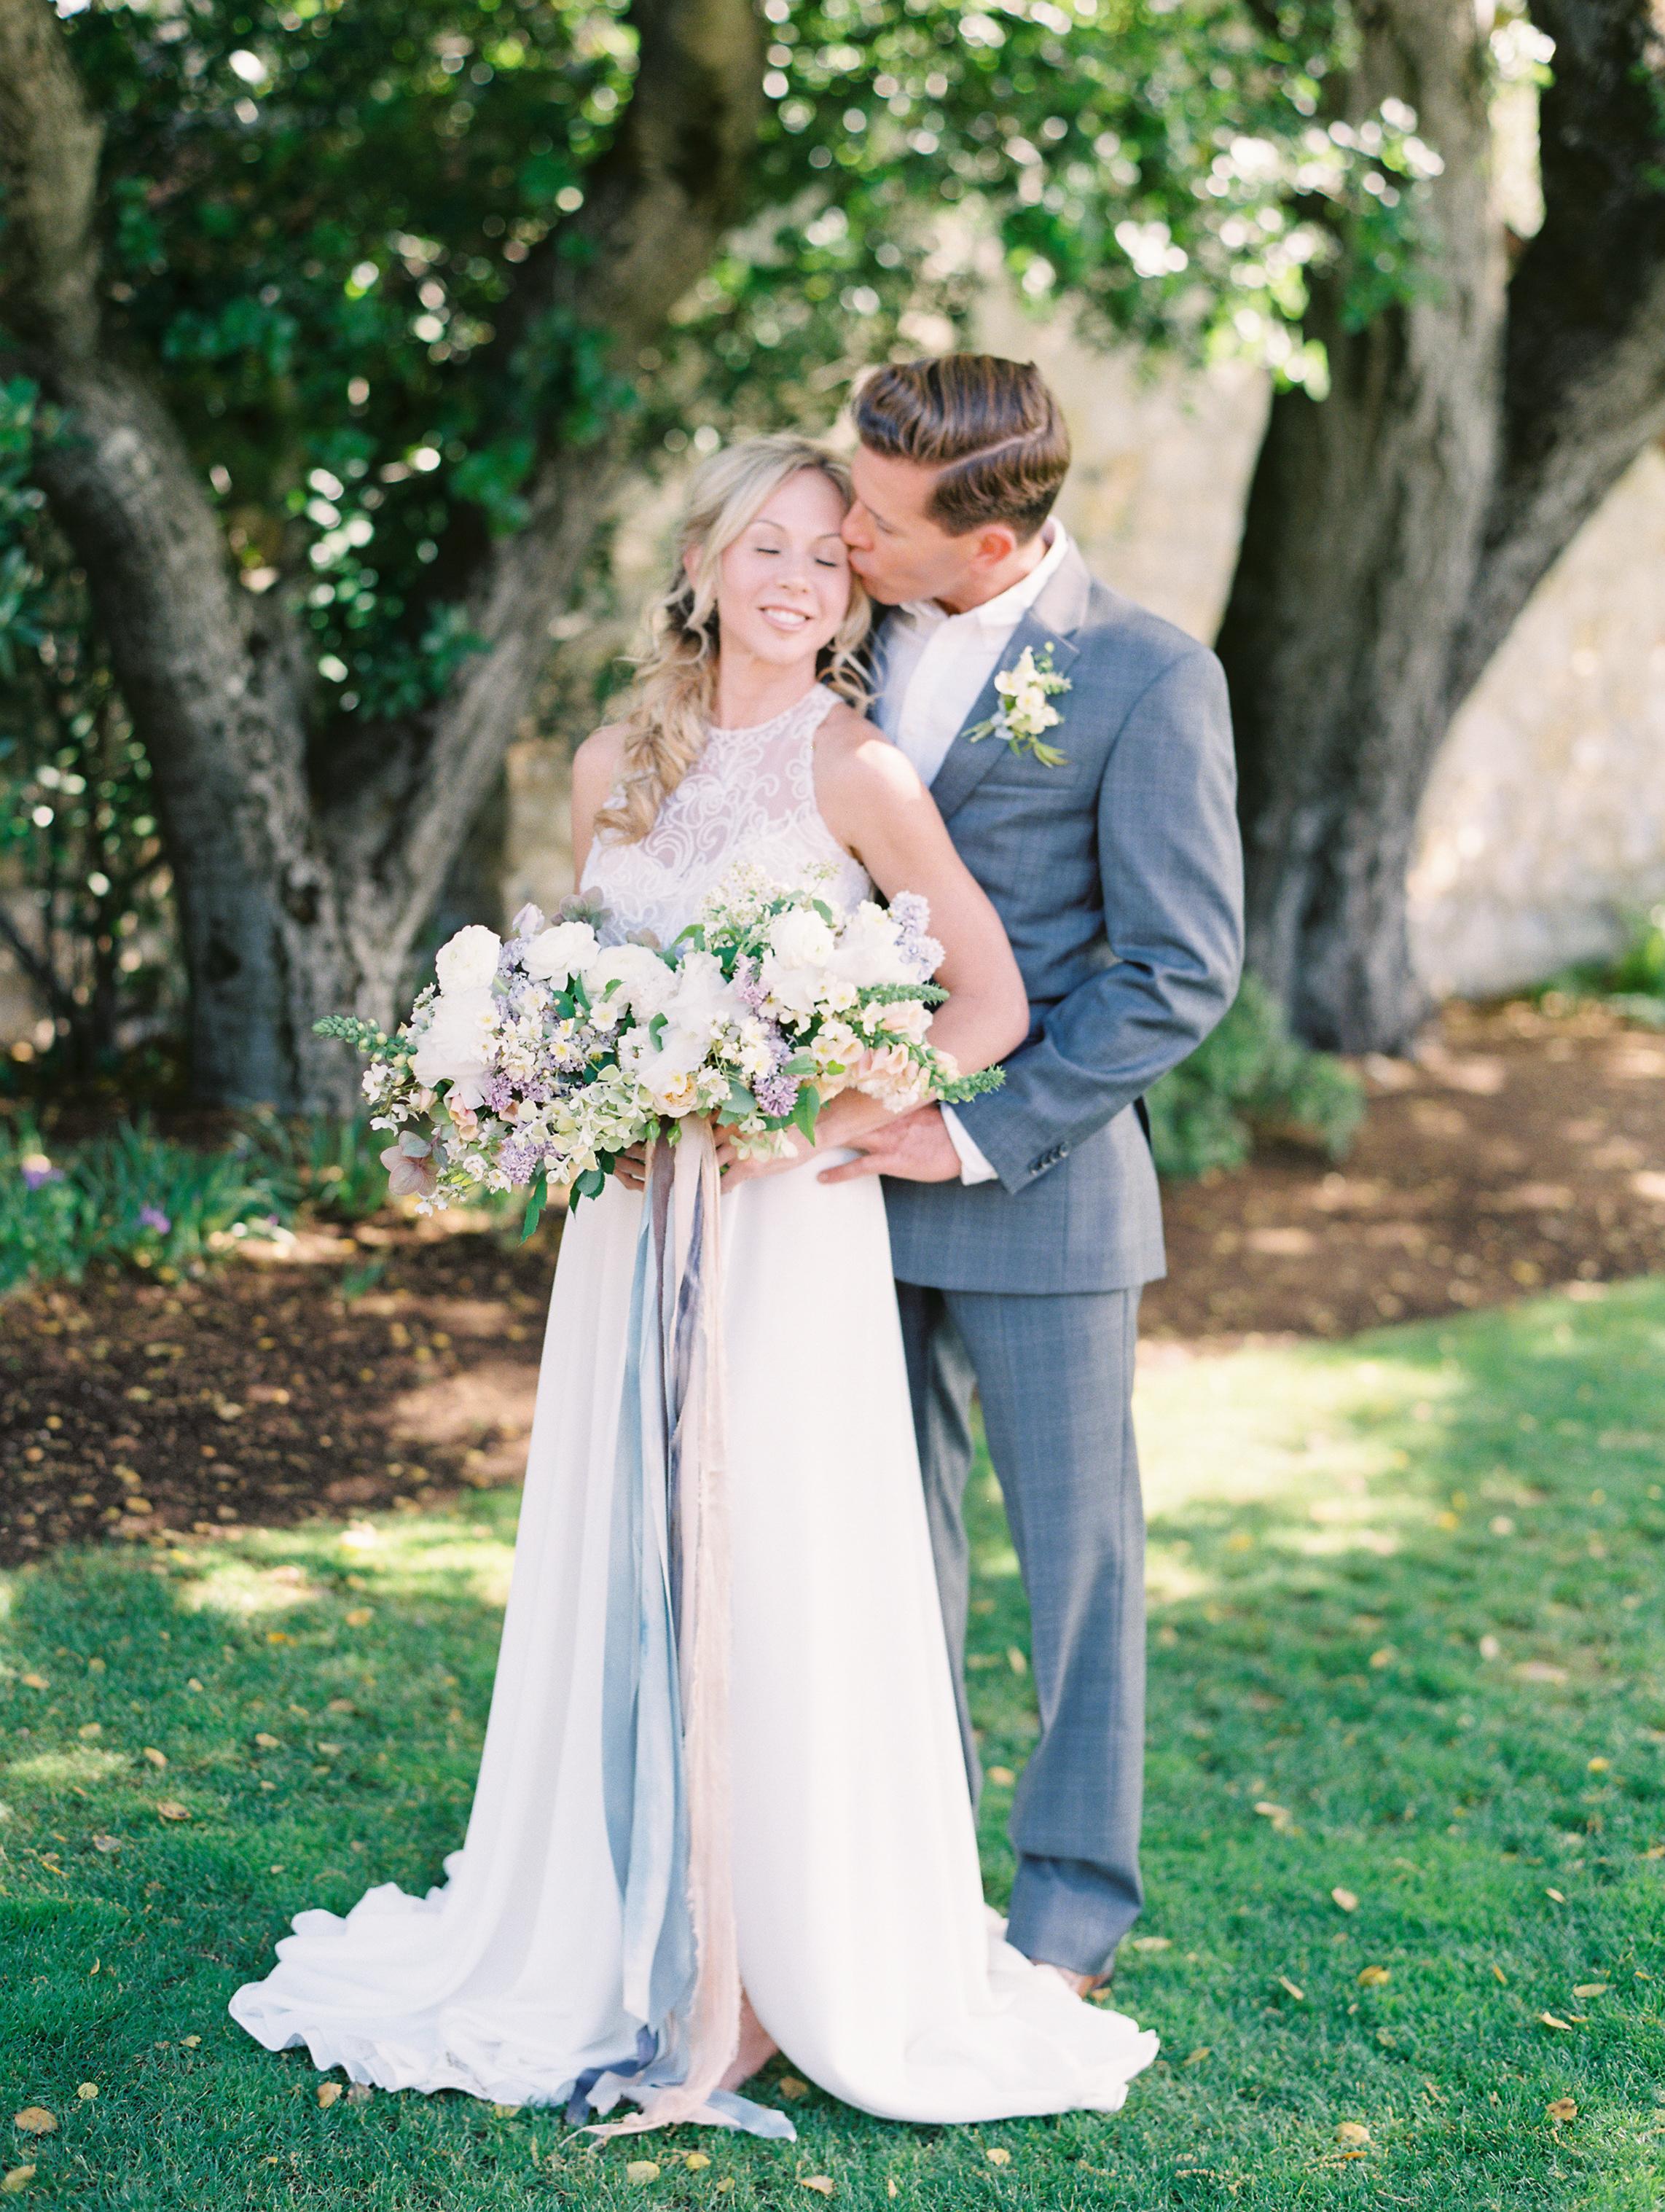 holman+ranch+wedding+bloom+workshop-24.jpg